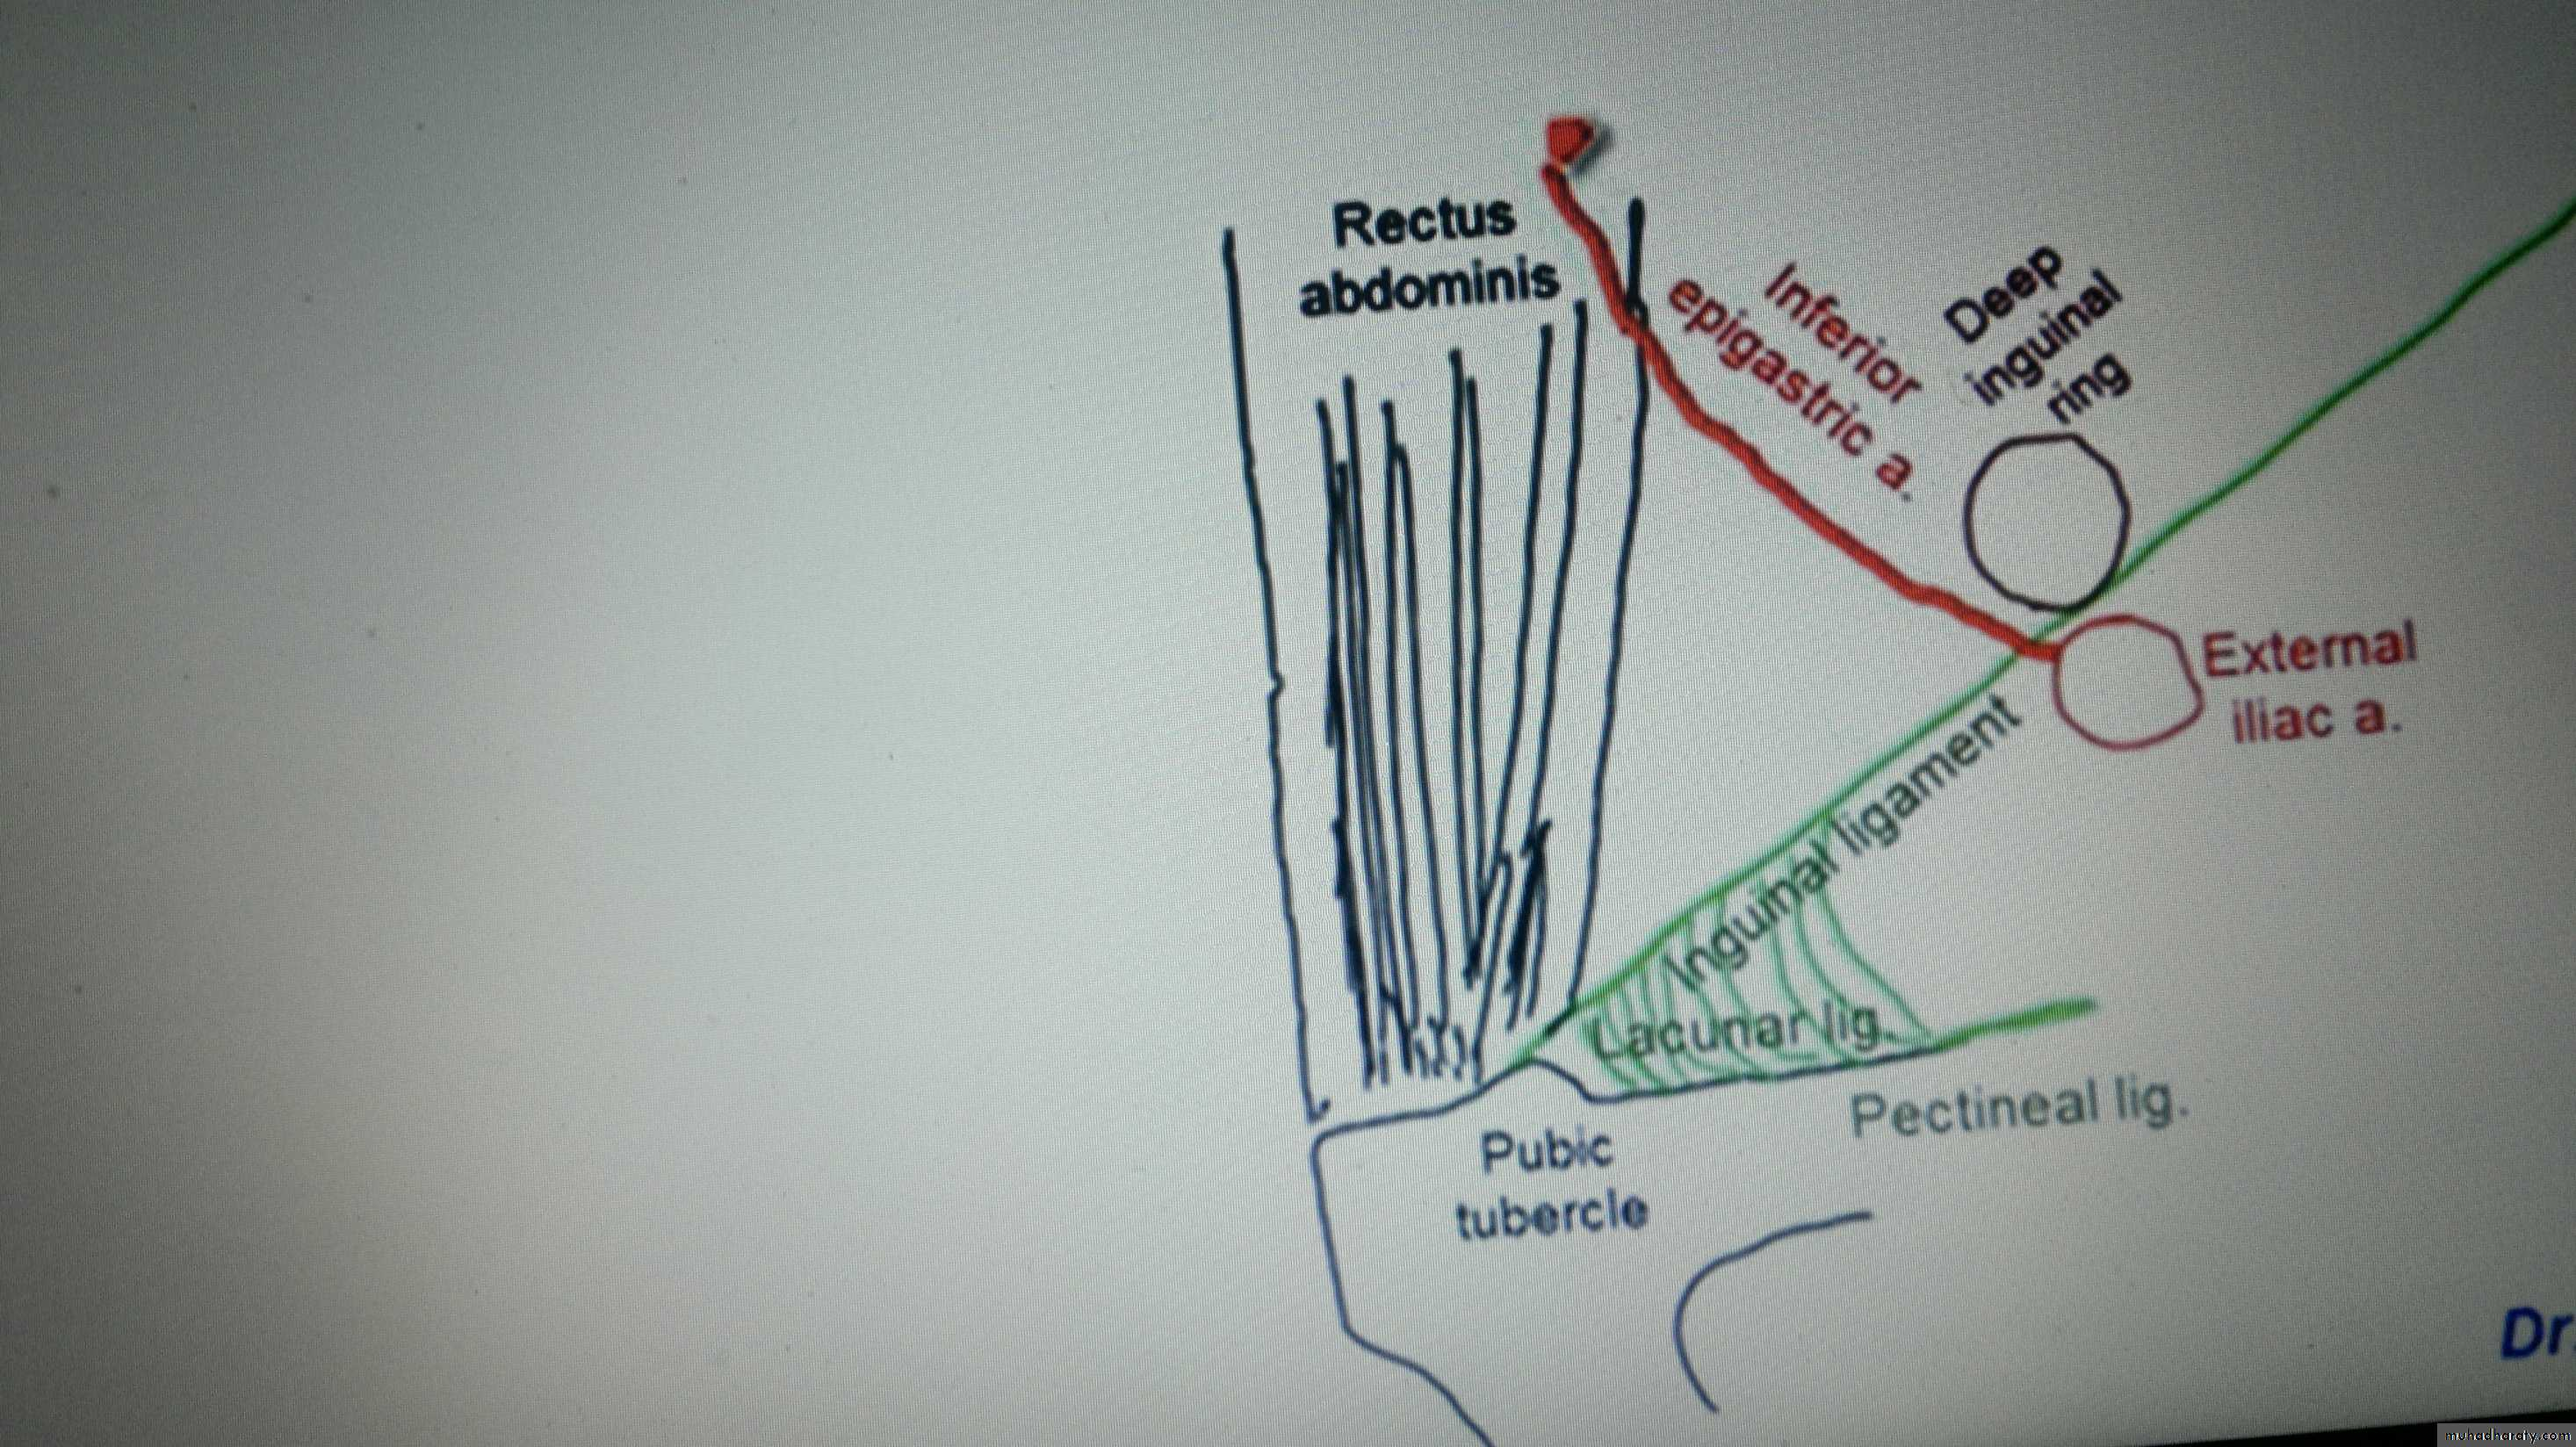 inguinal region anatomy with clinical notes pptx - RuQaYa FaLaH ...